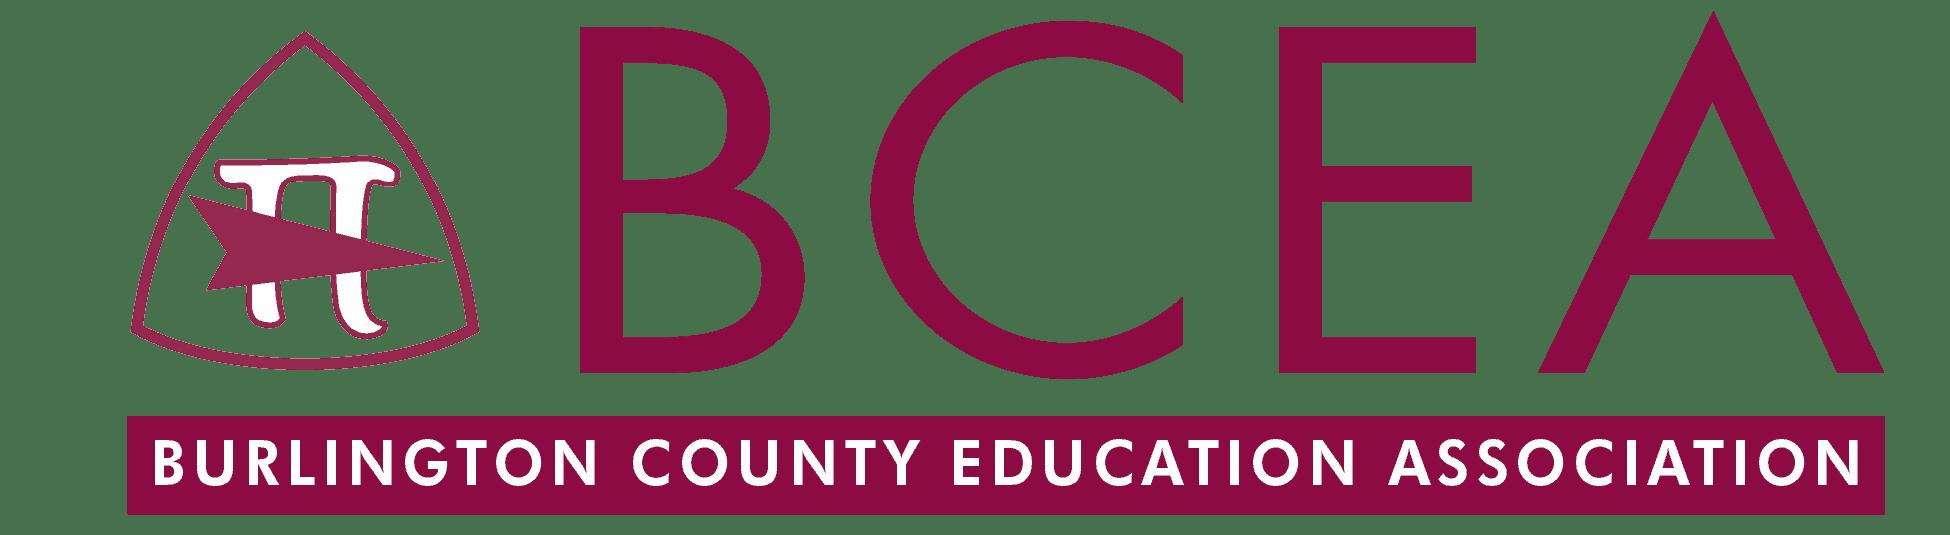 Burlington County Education Association